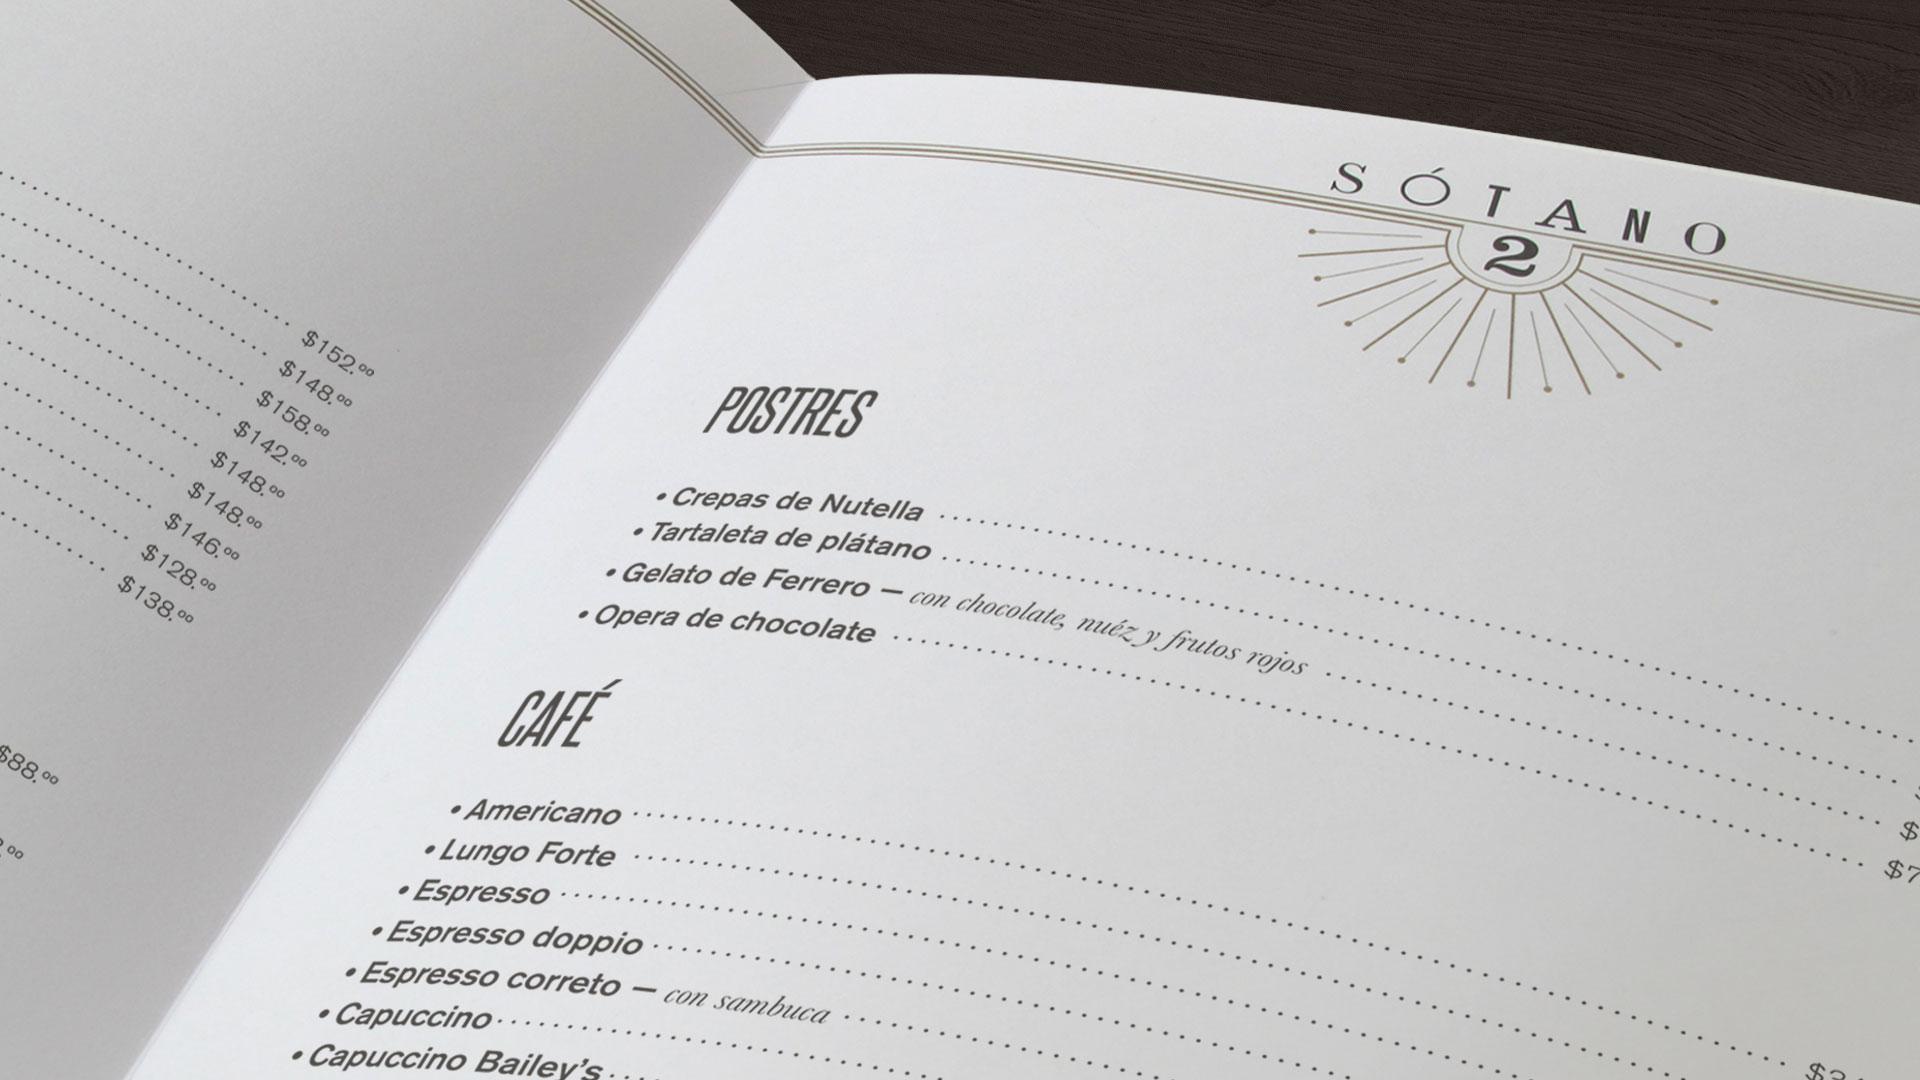 INTERIOR-POSTRES-SOTANO2